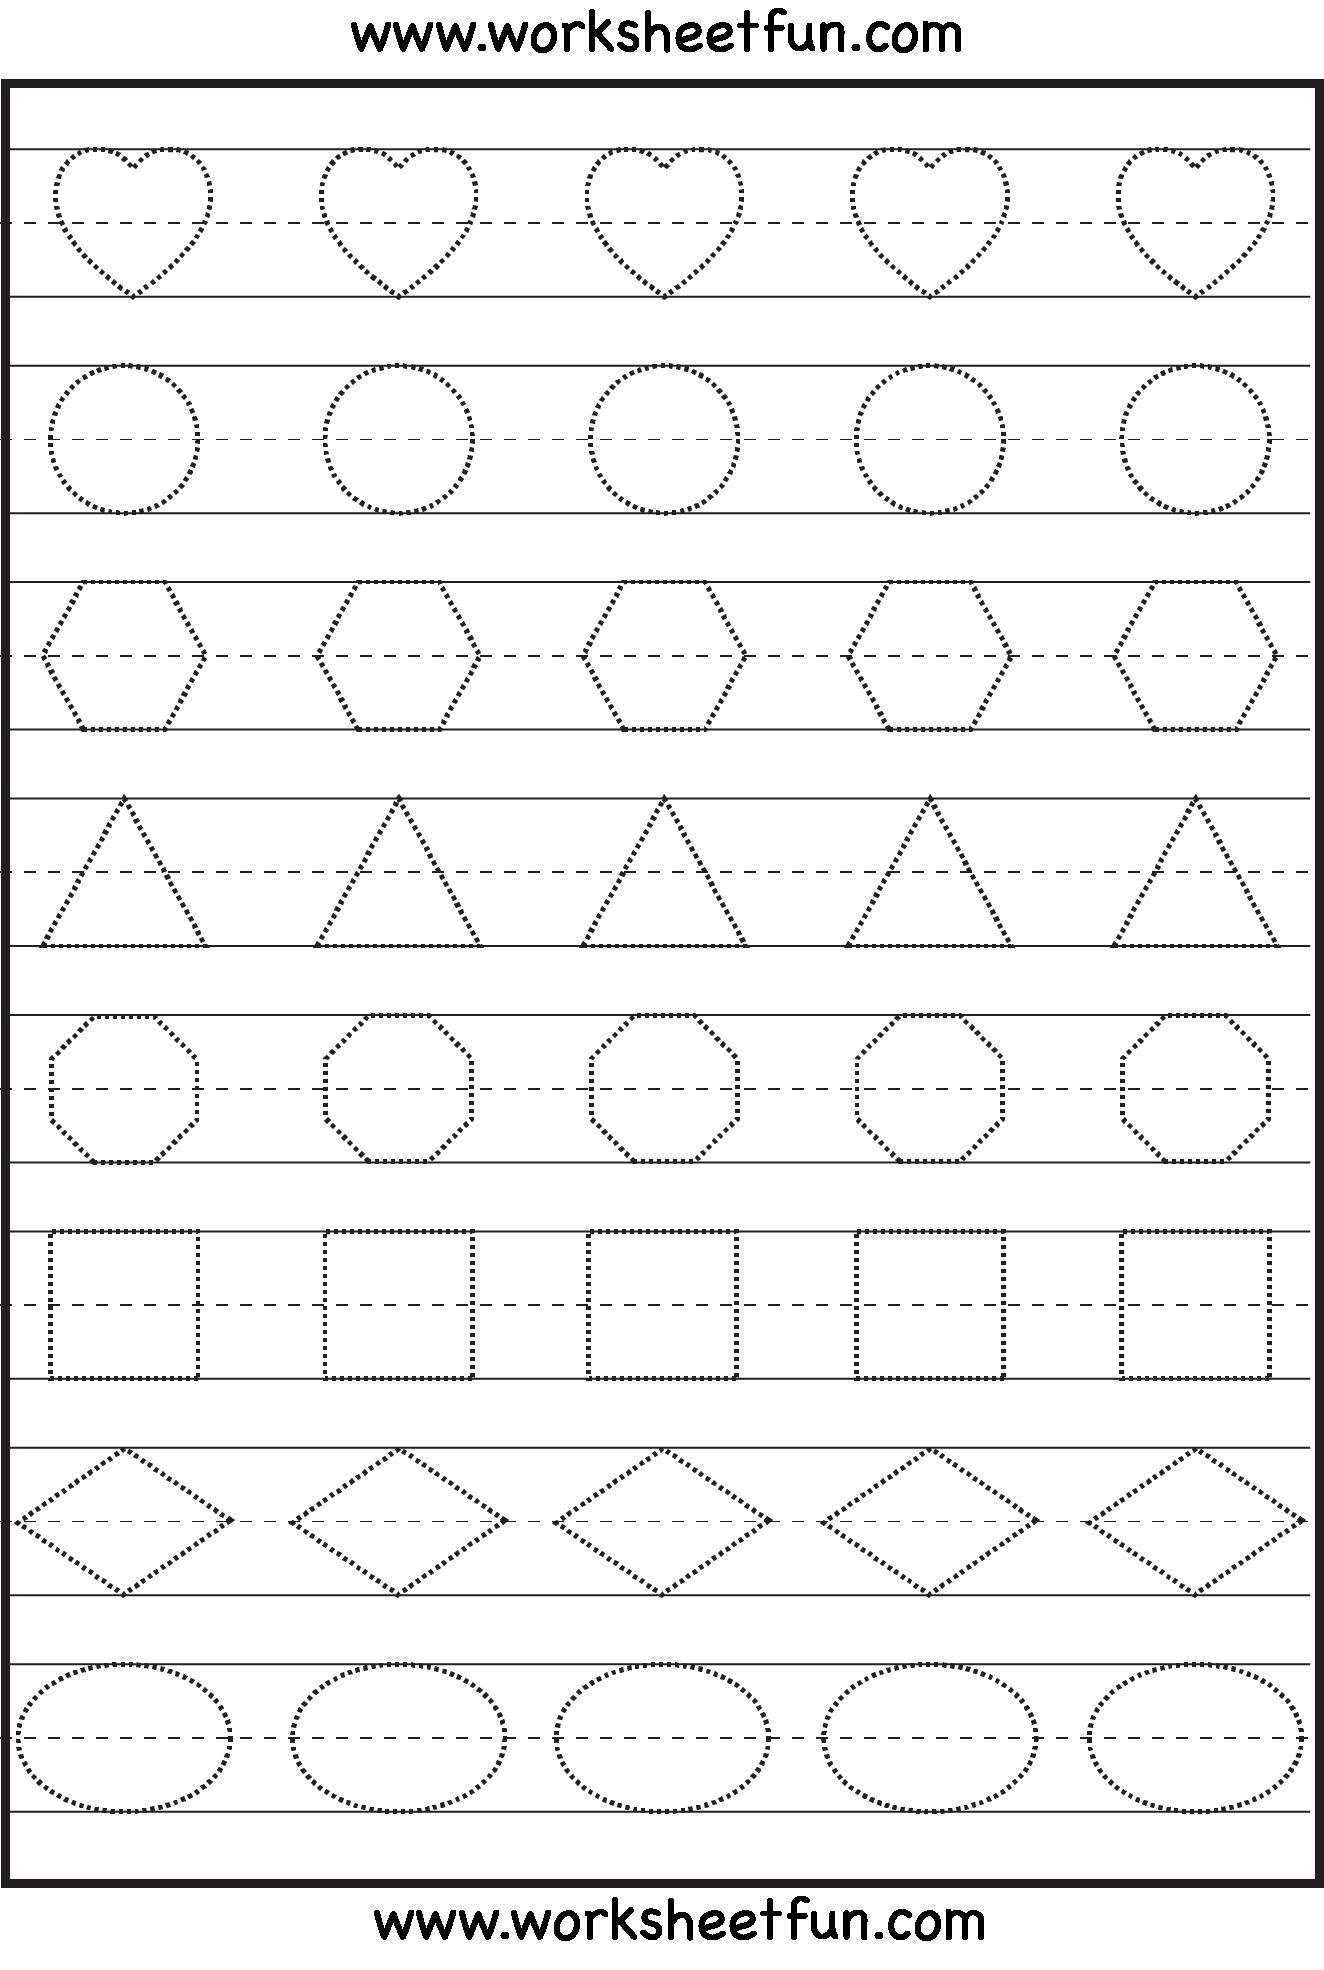 Free Pre K Worksheets Tracing - Worksheets